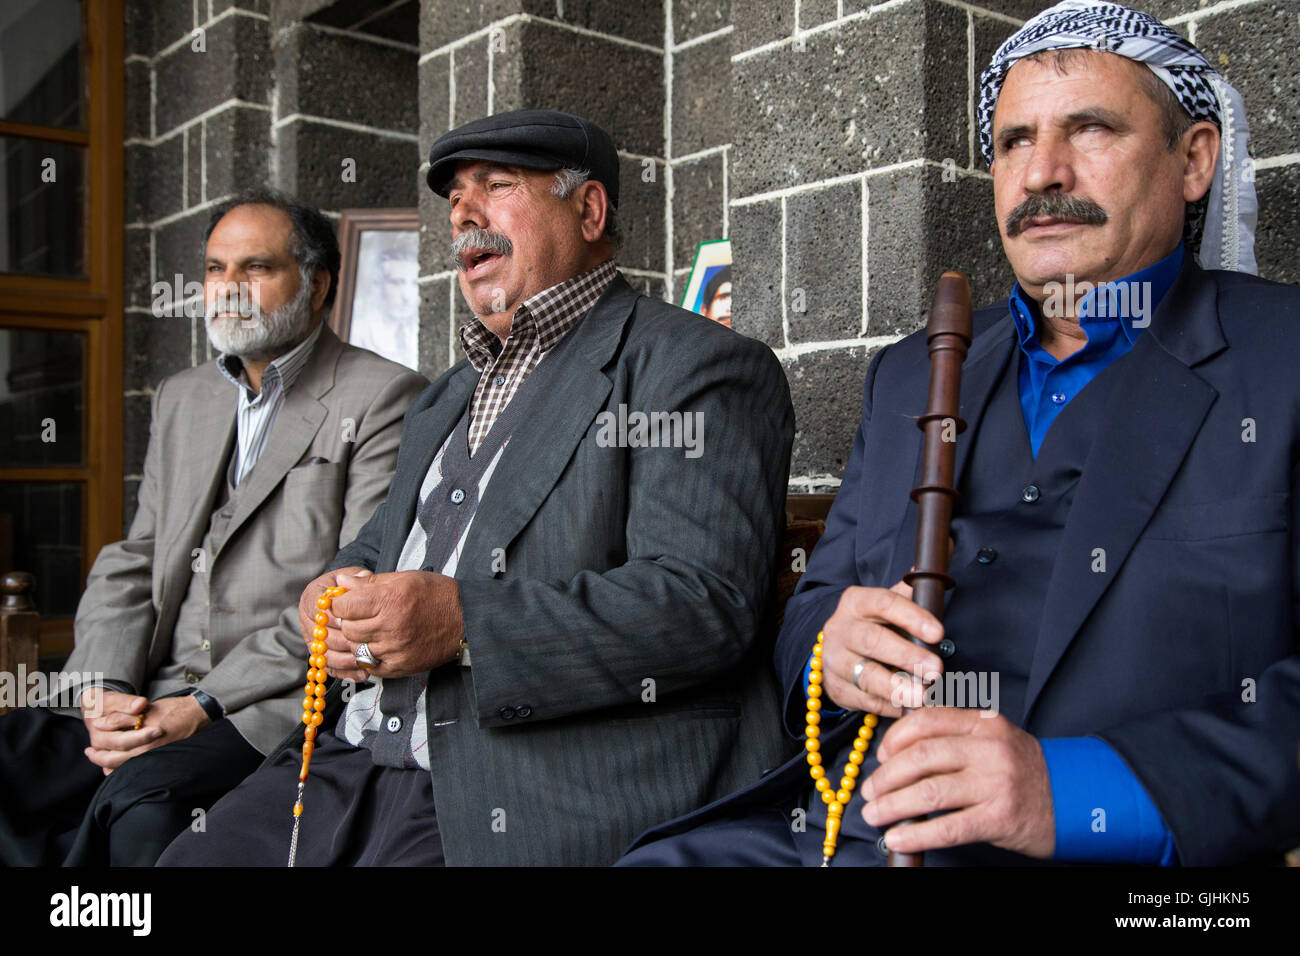 Dengbej singers  sing laments in dengbej house at  Diyarbakır. - Stock Image